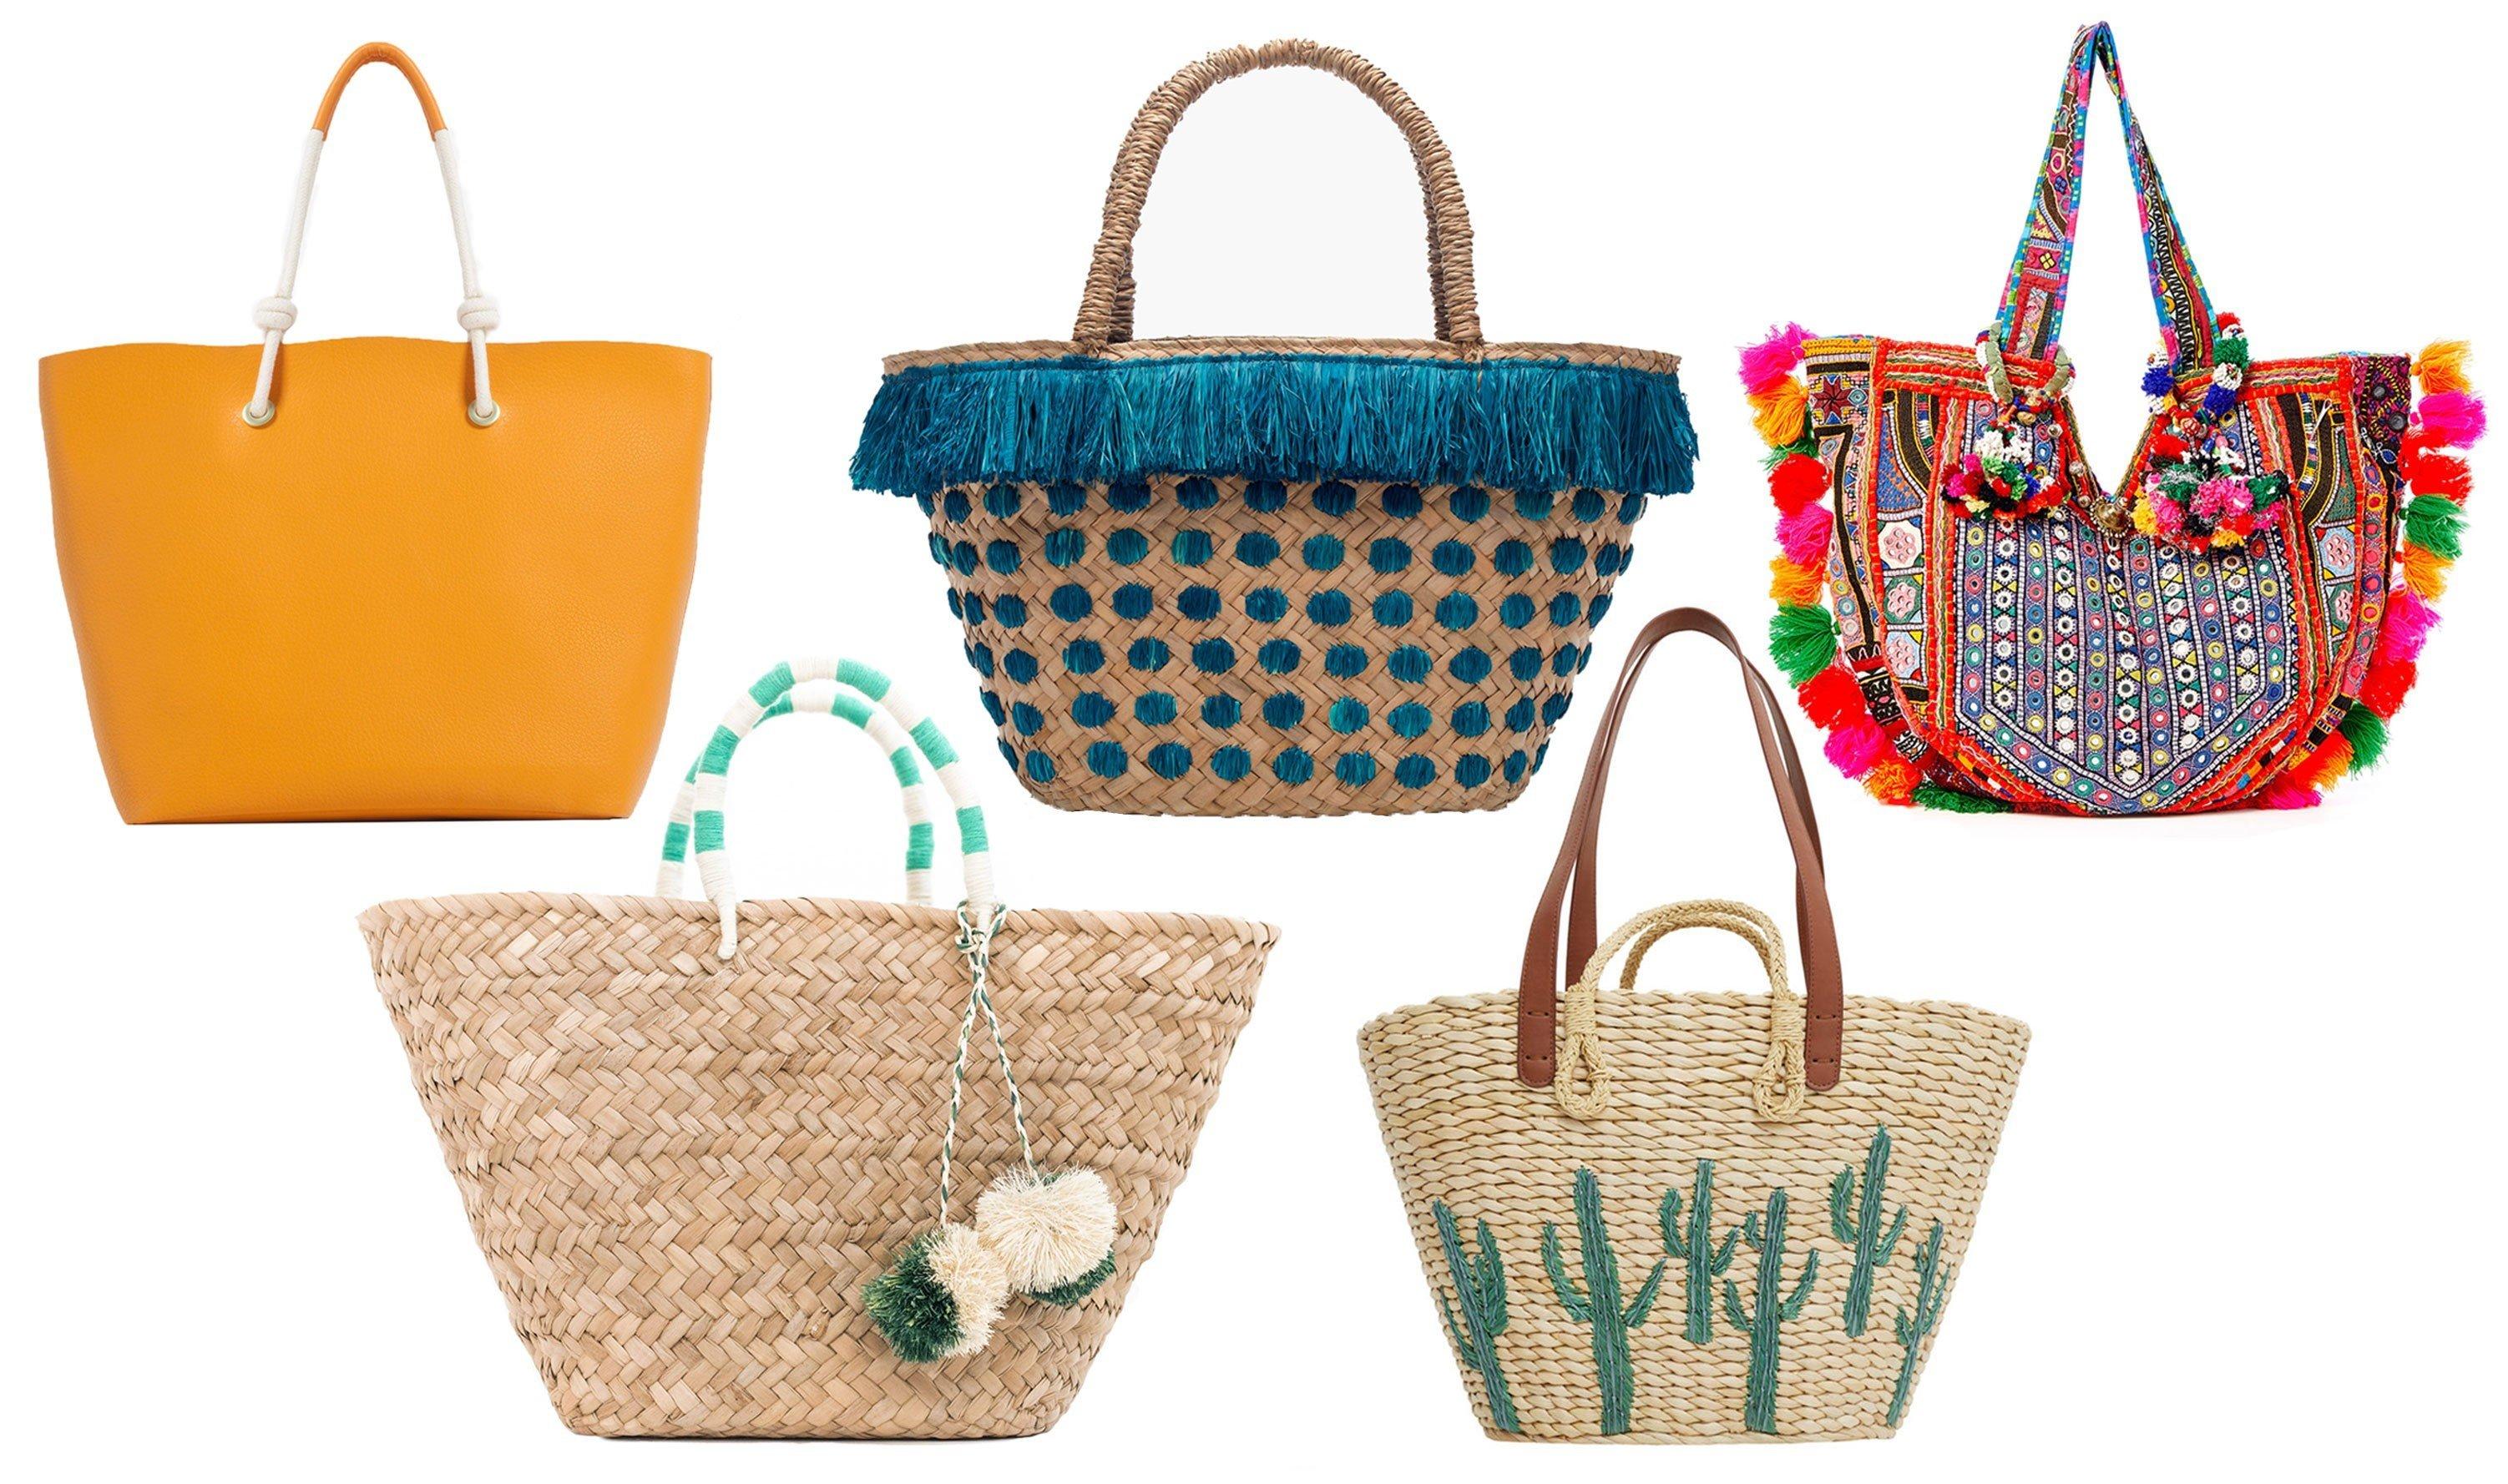 Style + Design handbag straw bag basket product fashion accessory tote bag